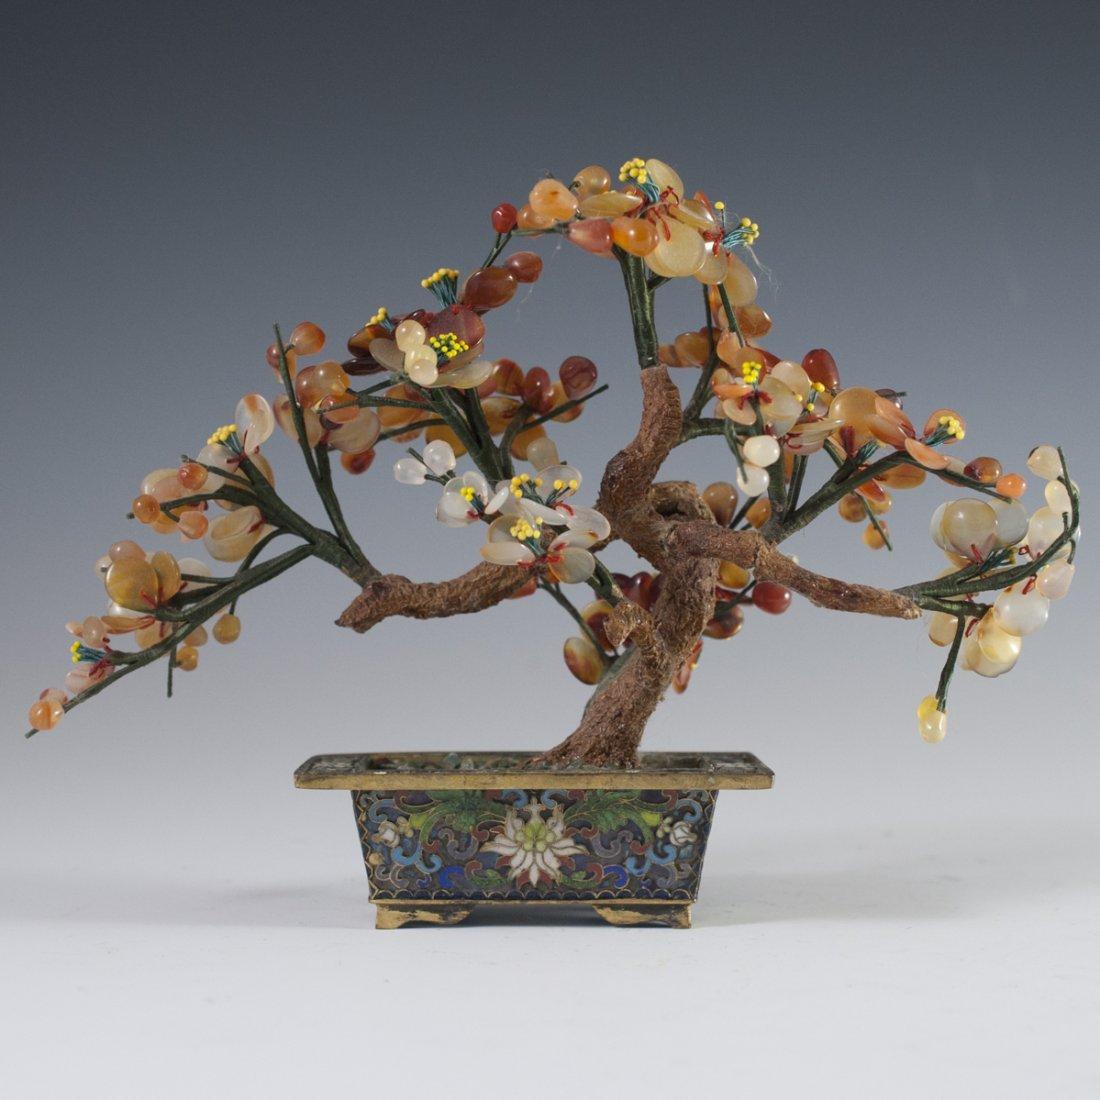 Chinese Enameled Cloissone Agate Bonsai Trees - 5